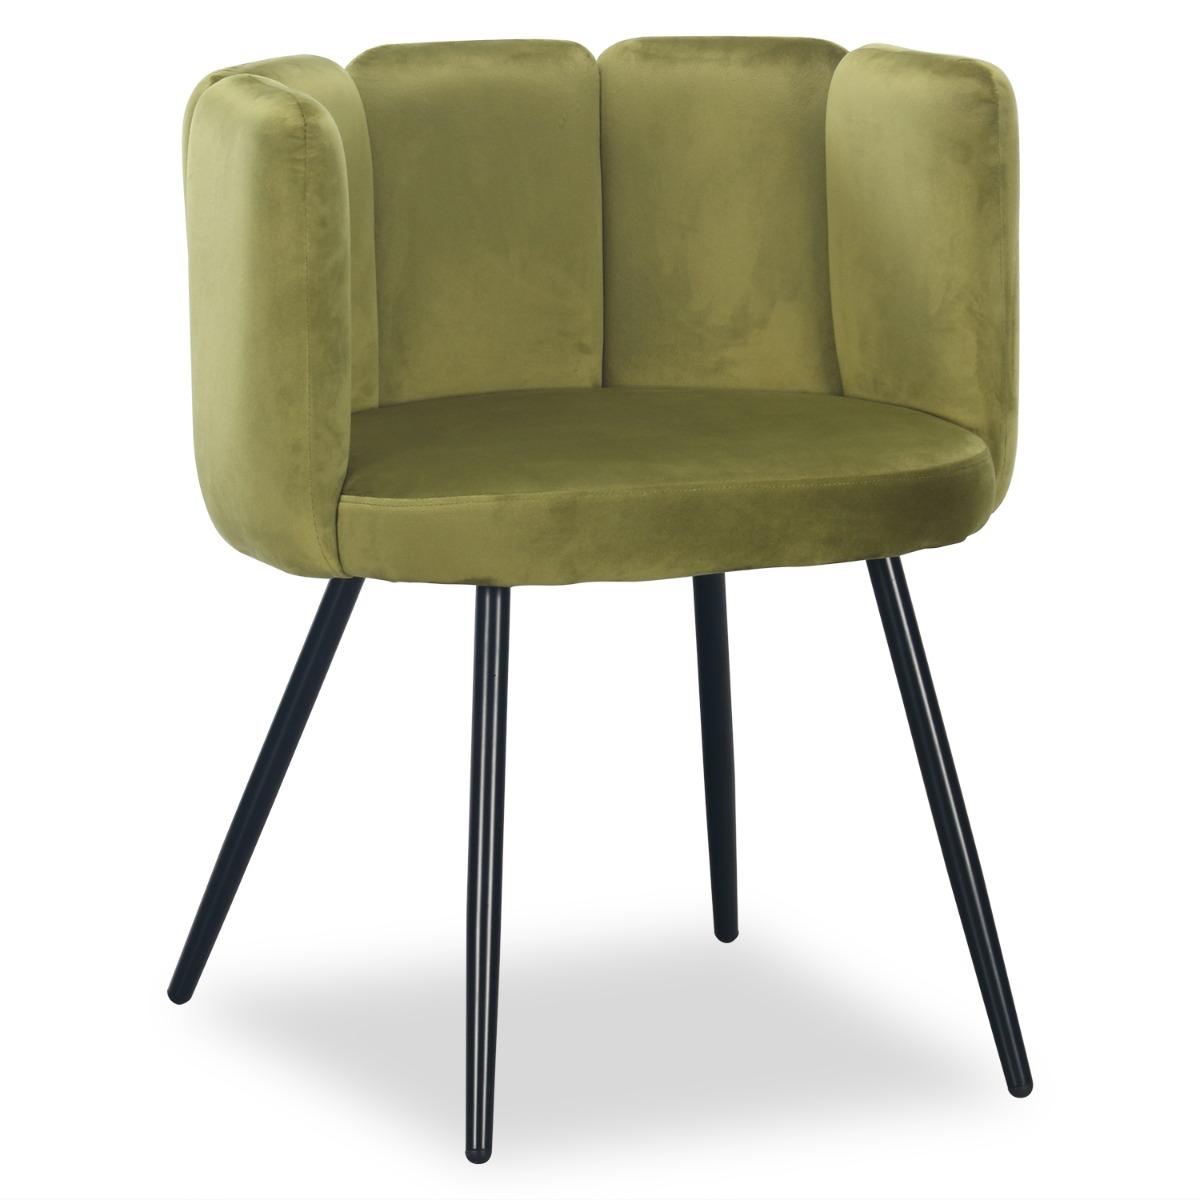 Set van 2 stoelen Amela Velvet Khaki